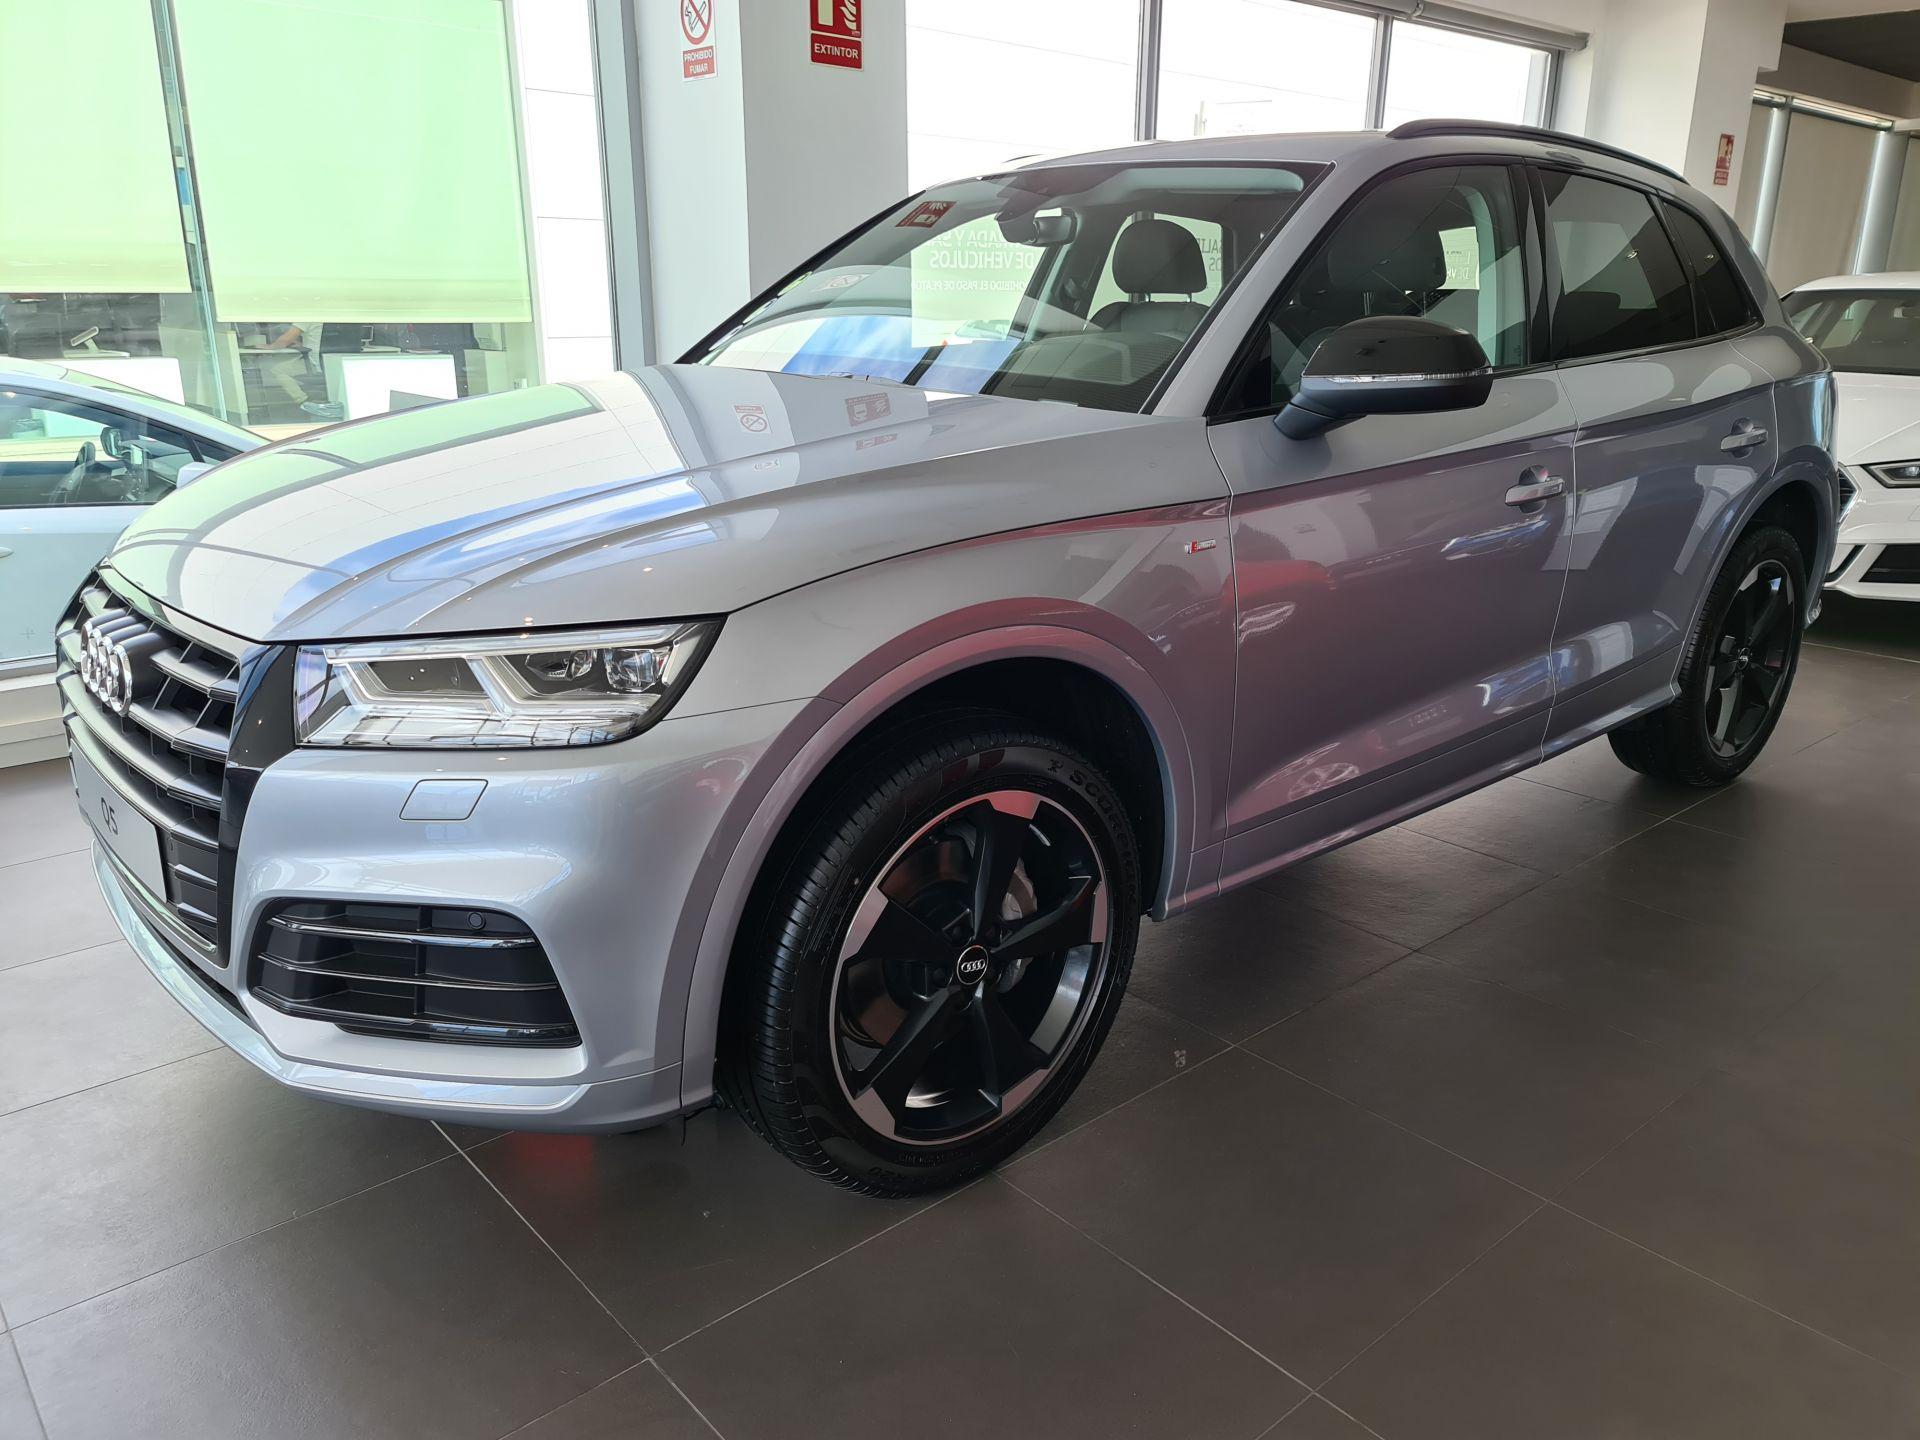 Audi Q5 Black line 40 TDI 140kW quattro S tronic nuevo Madrid